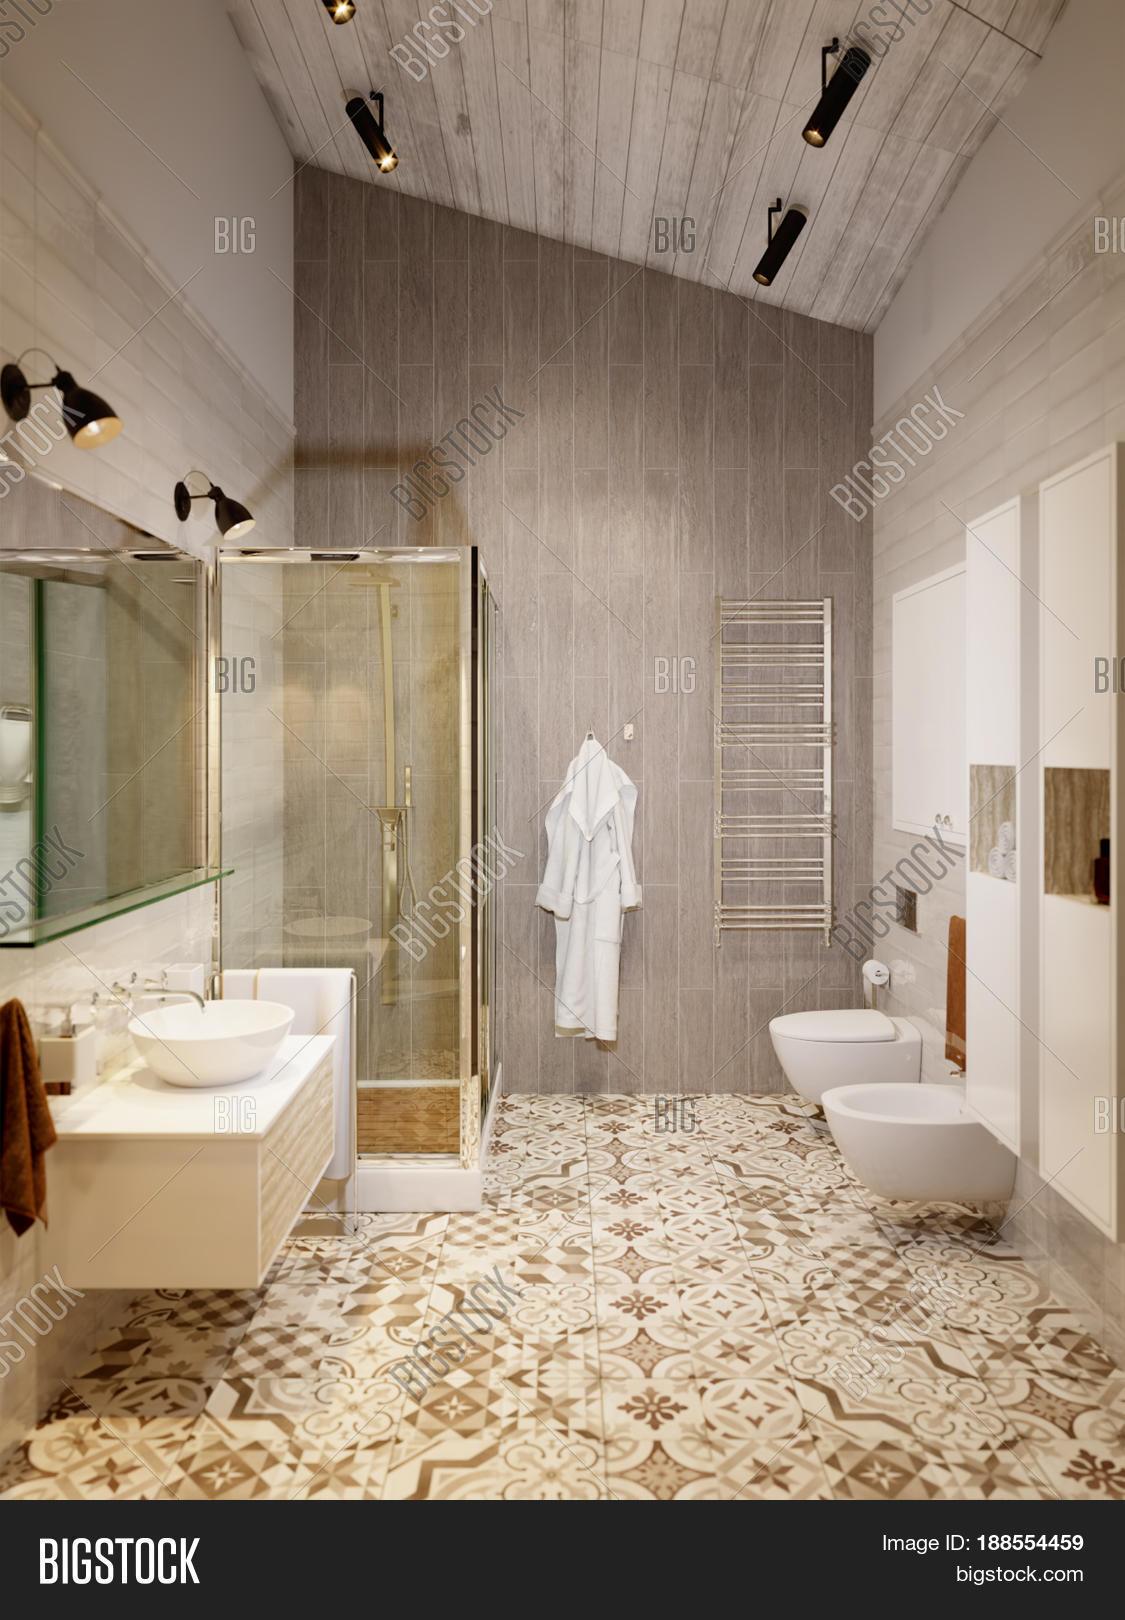 Rustic provence loft bathroom shower wc room interior for Provence bathroom design